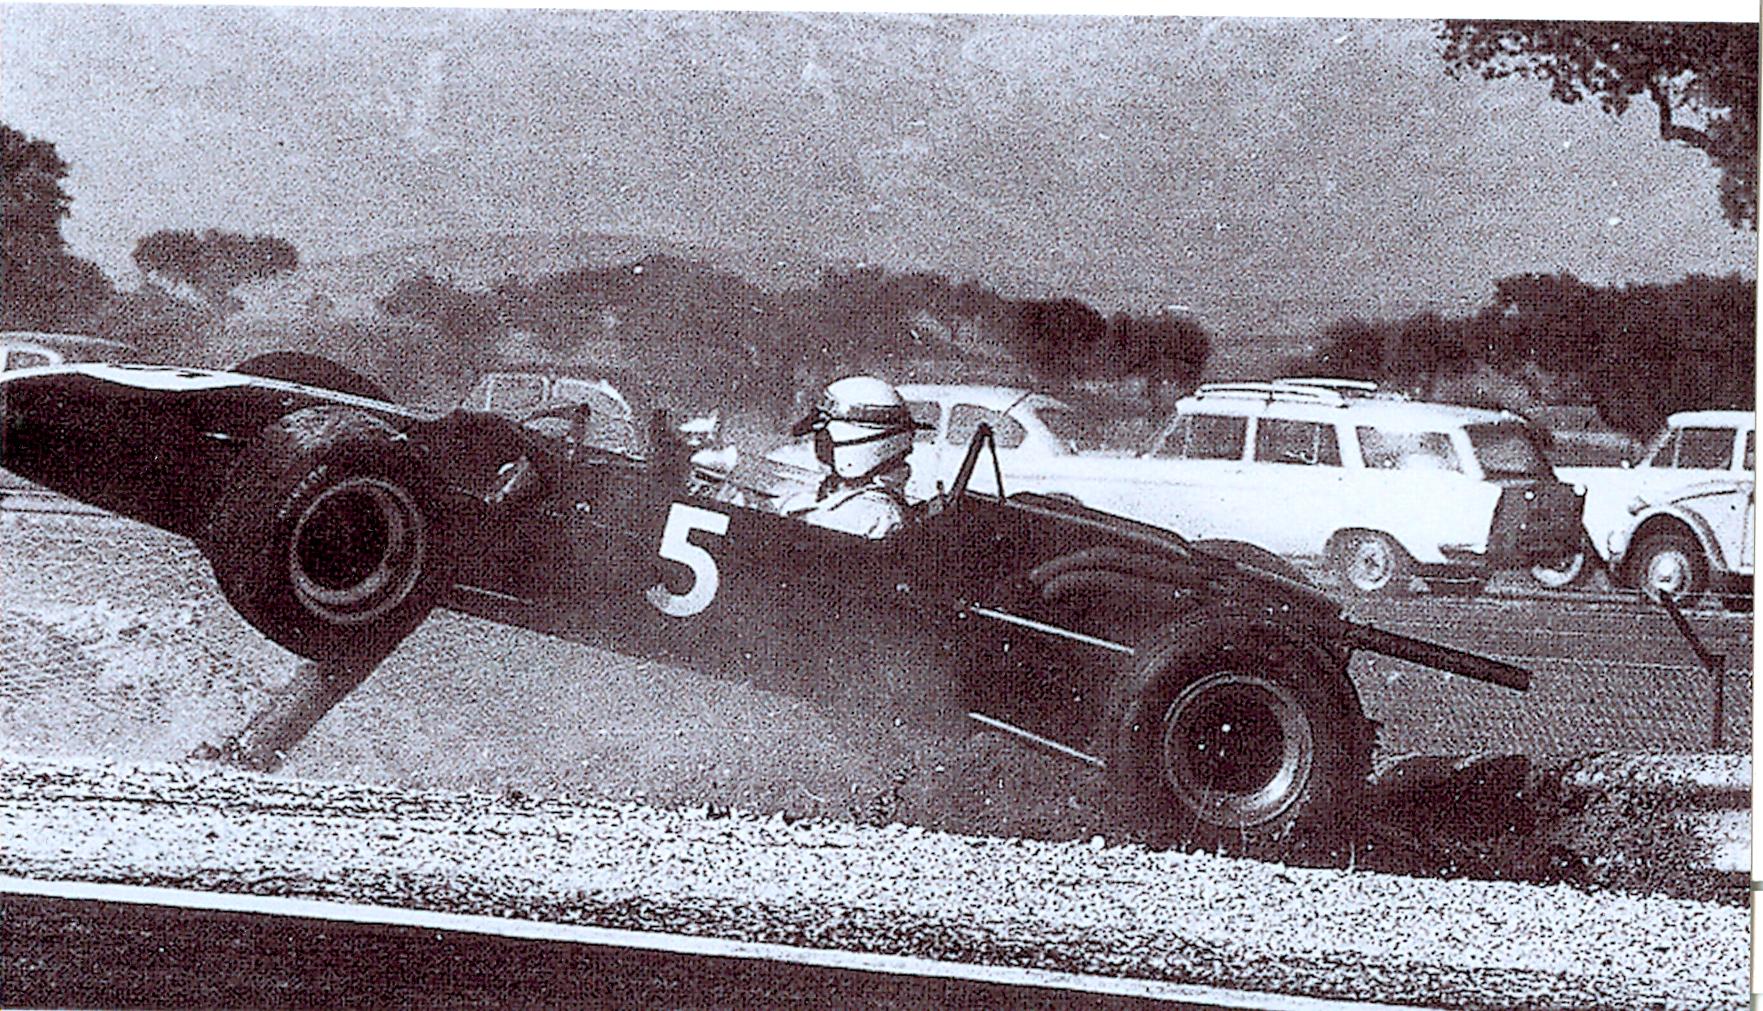 Circuito del Jarama - 1967 - GP España - Jackie-Stewart